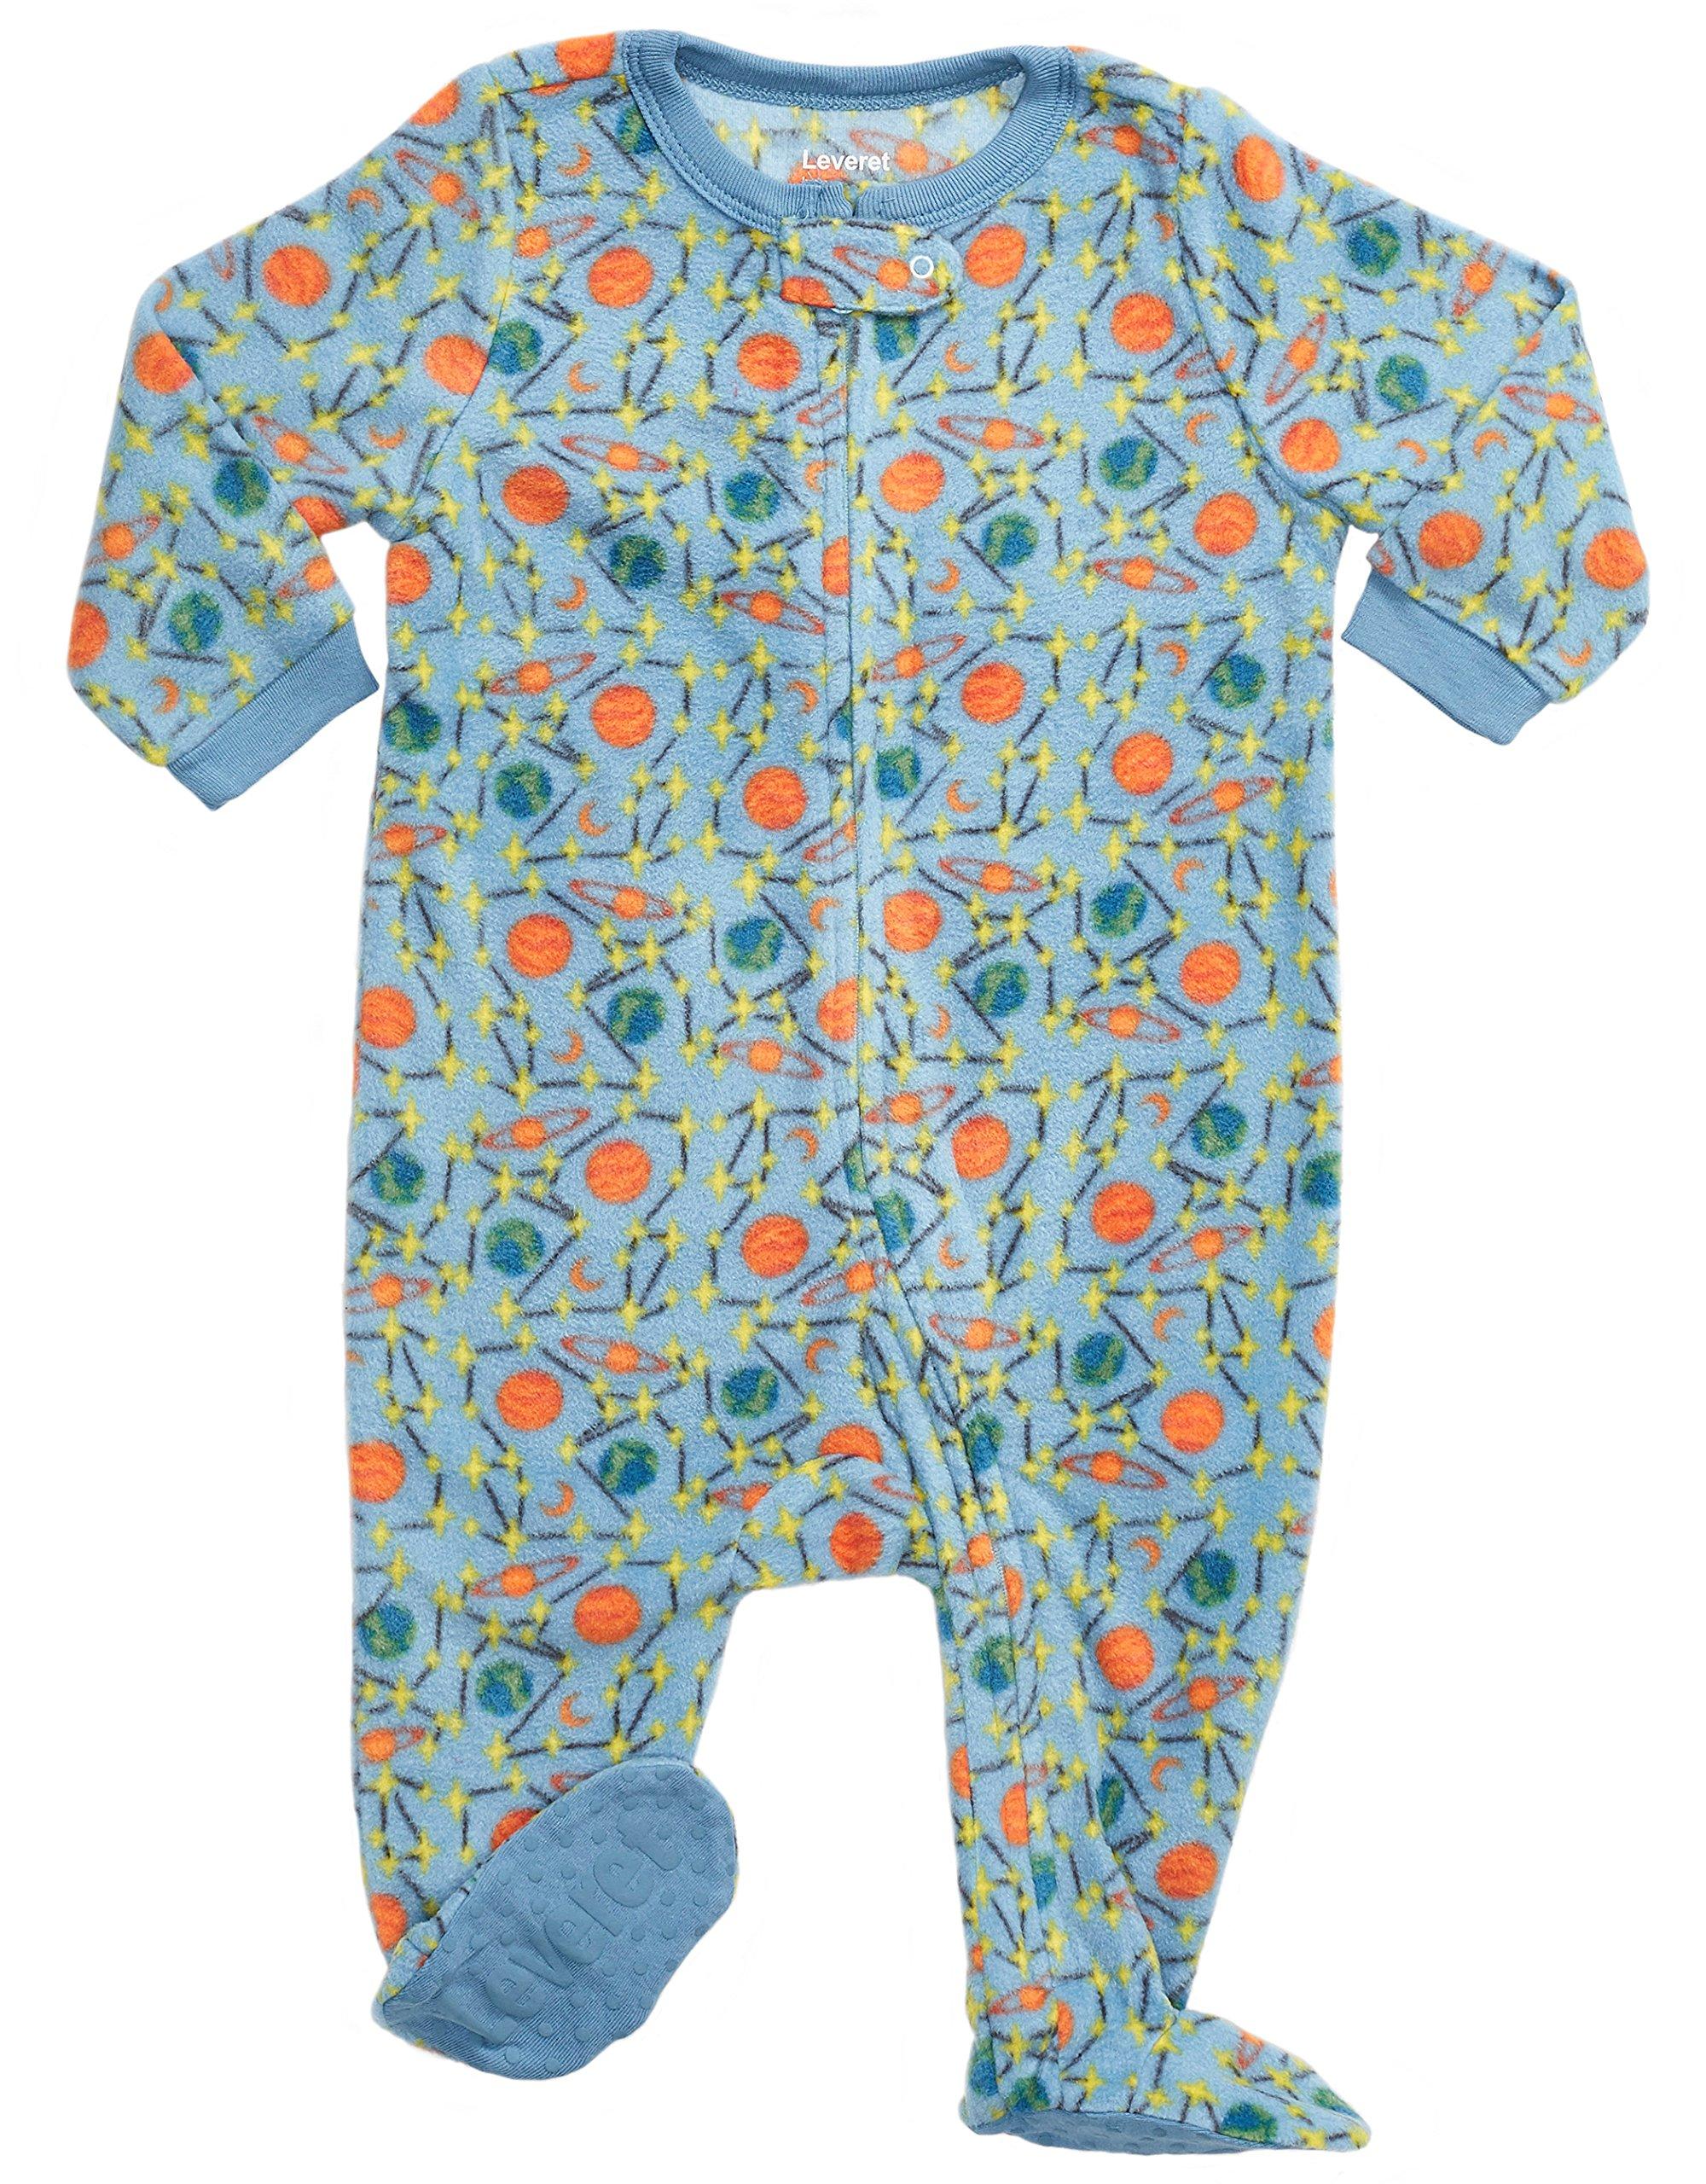 Leveret Fleece Baby Boys Footed Pajamas Sleeper Kids /& Toddler Pajamas 3